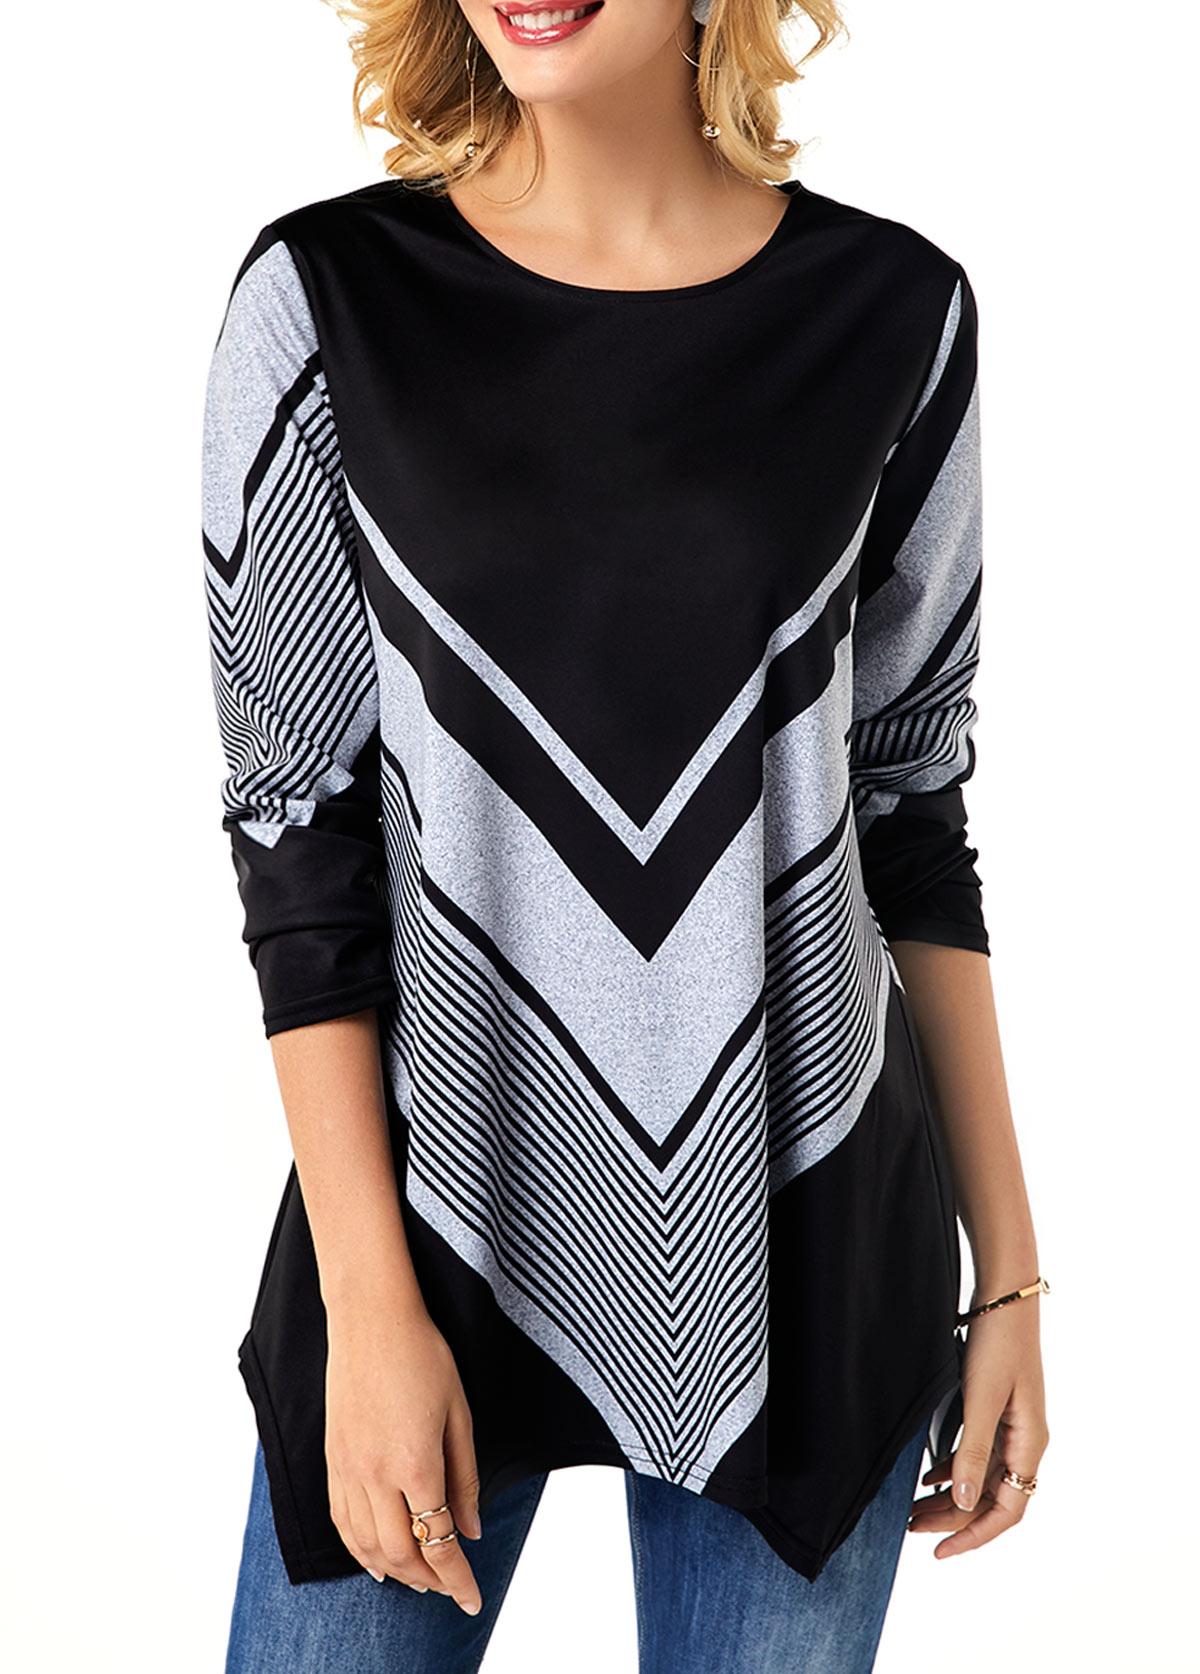 Geometric Print Round Neck Long Sleeve Black T Shirt